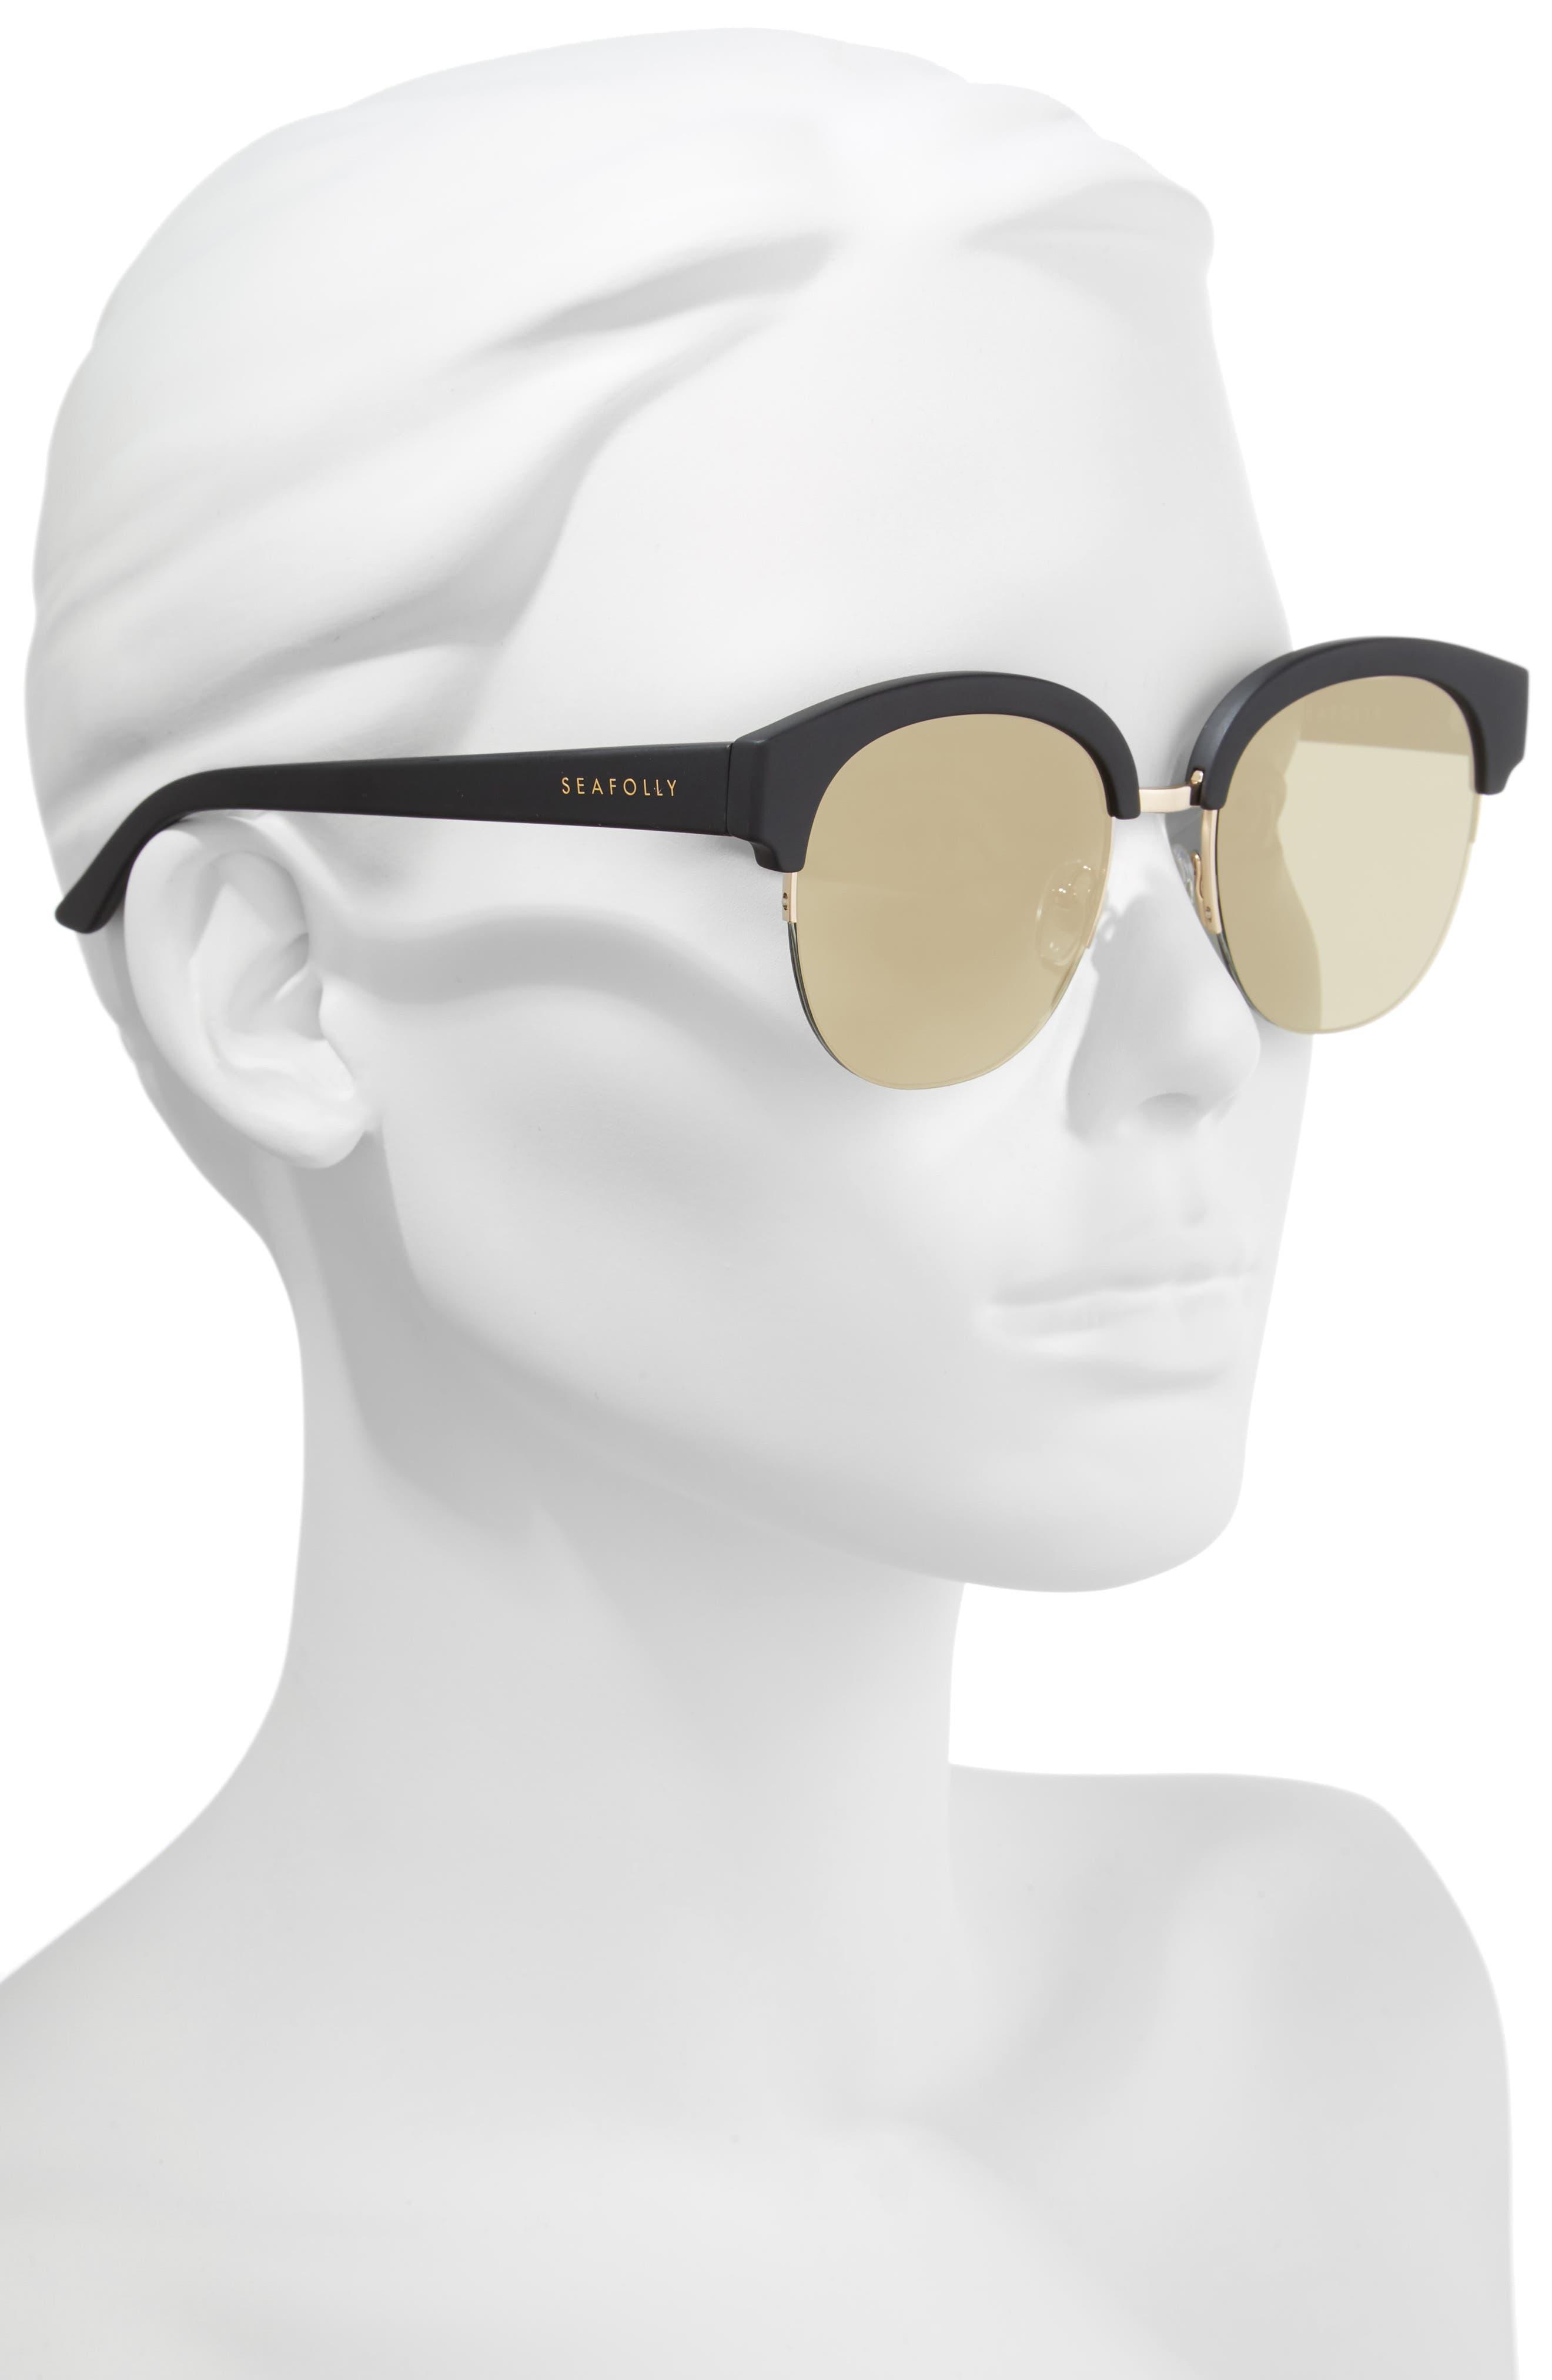 Wategos 53mm Cat Eye Sunglasses,                             Alternate thumbnail 2, color,                             Black